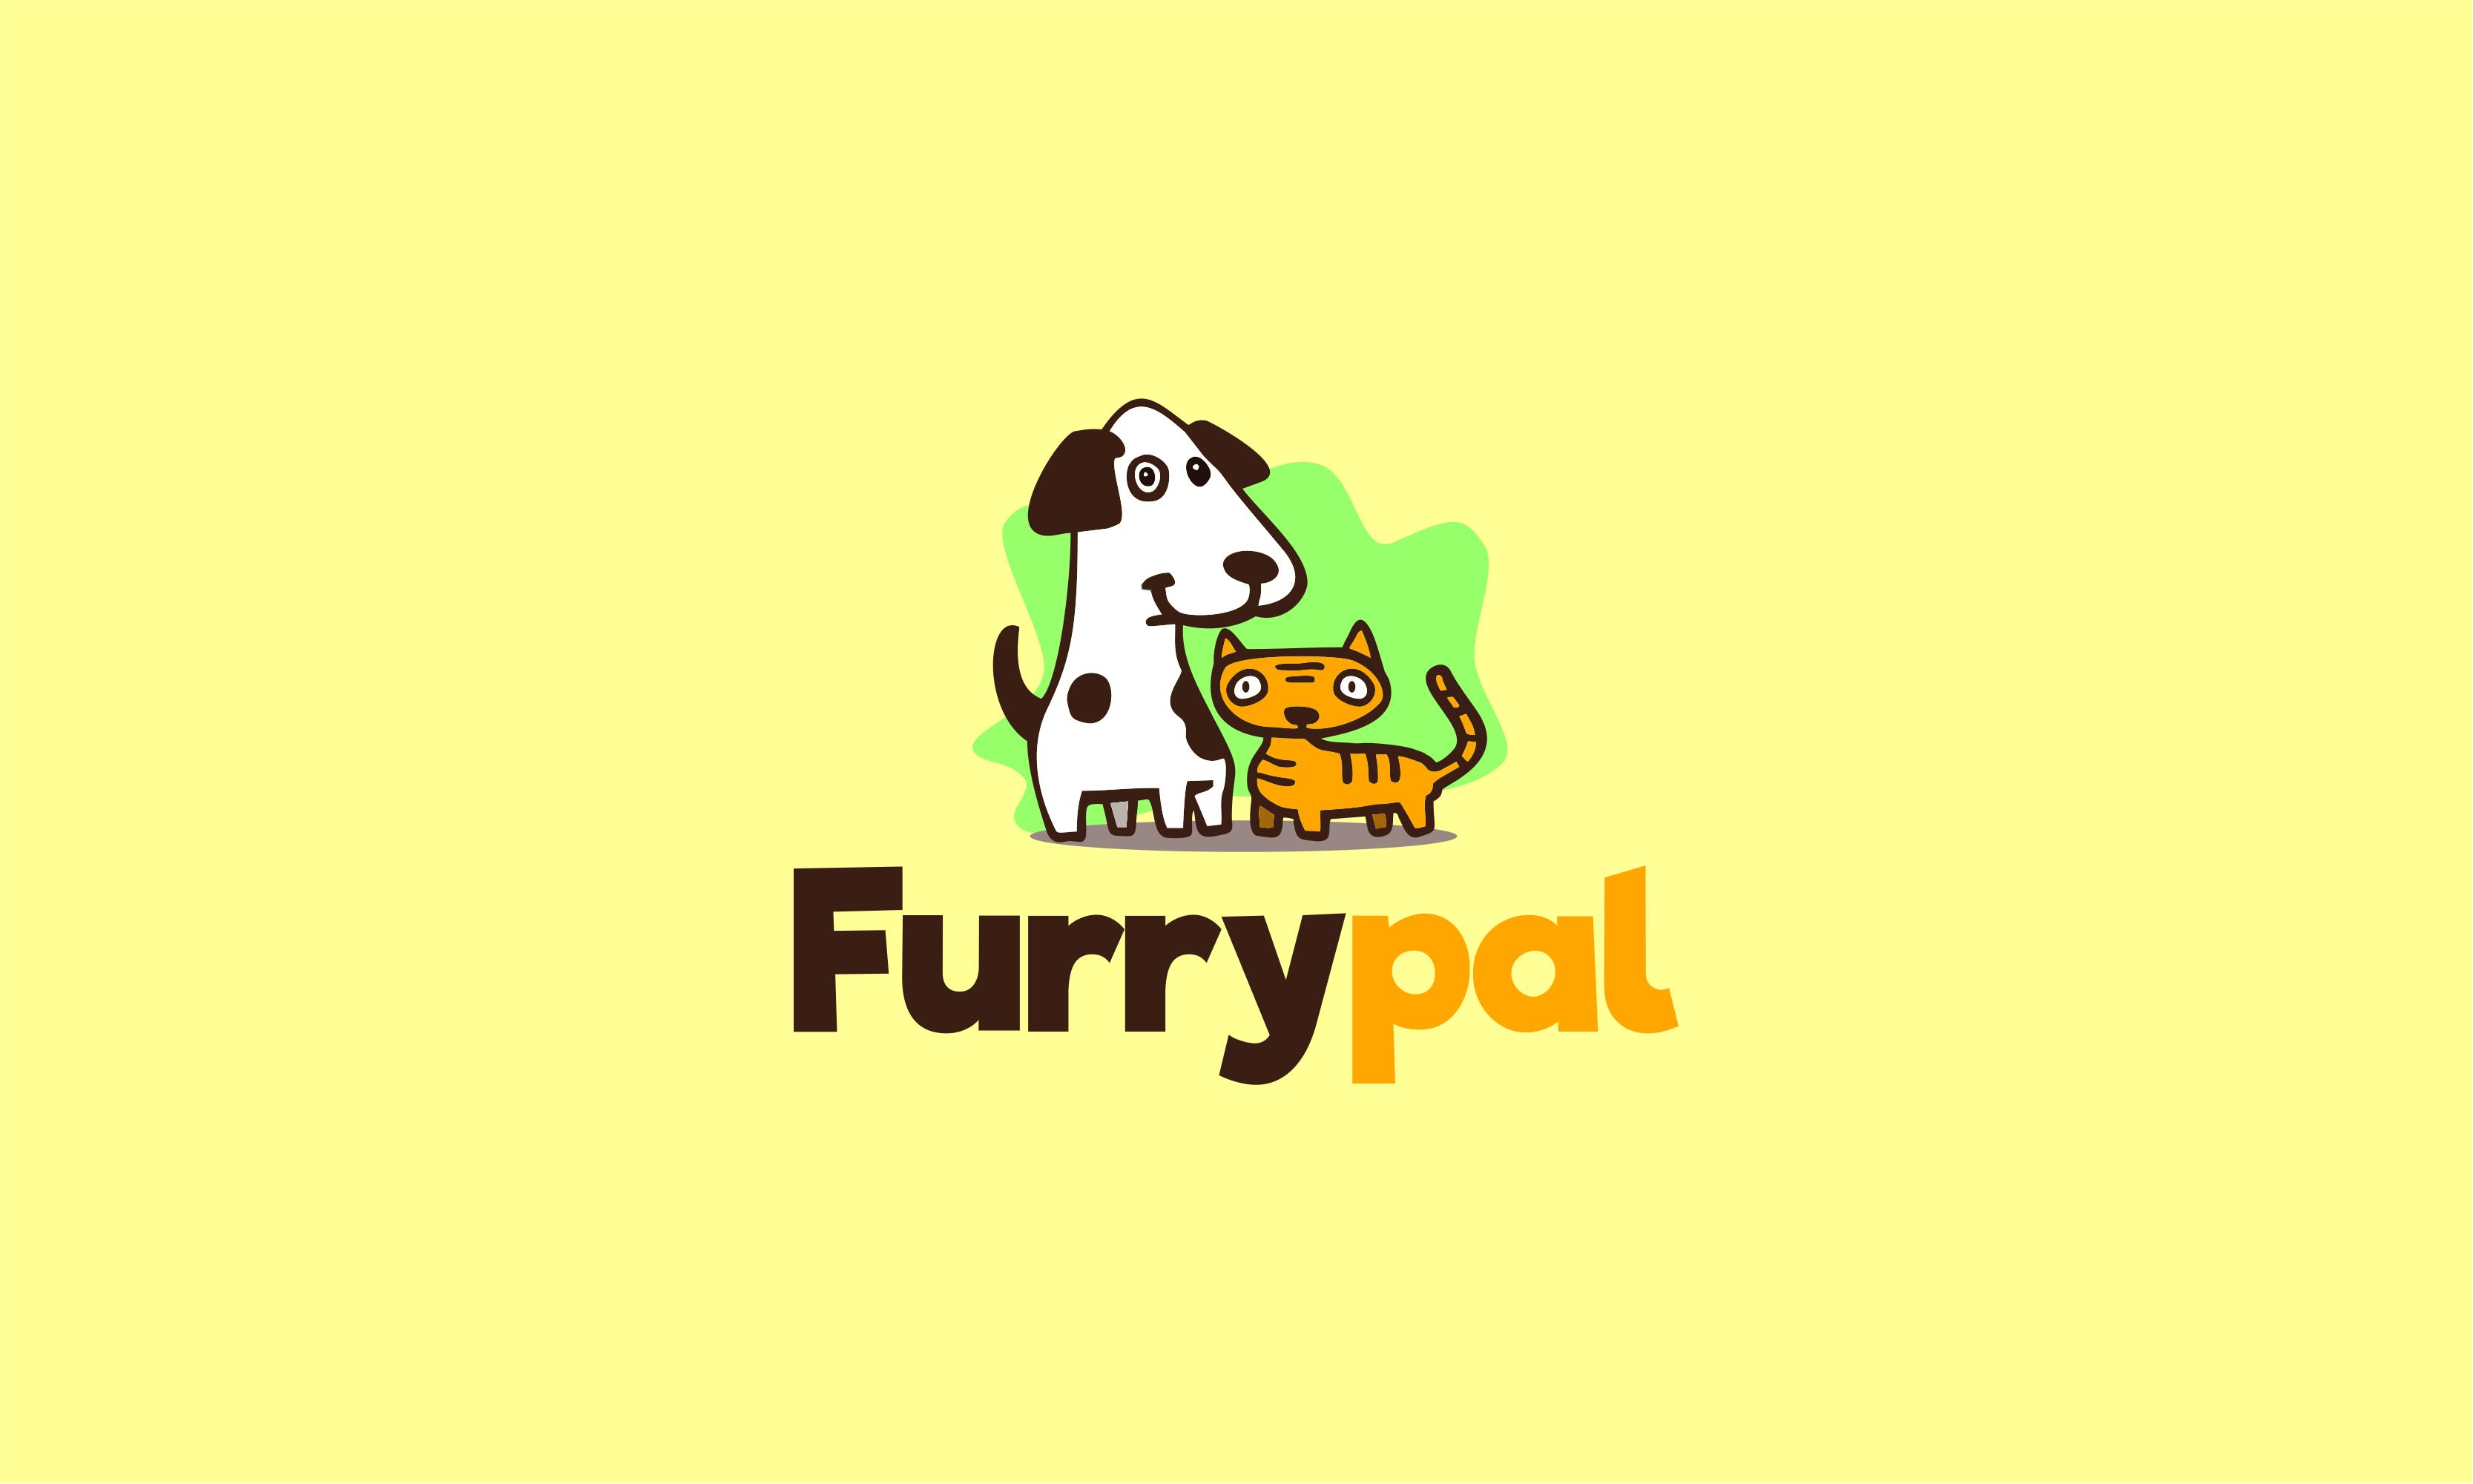 Furrypal